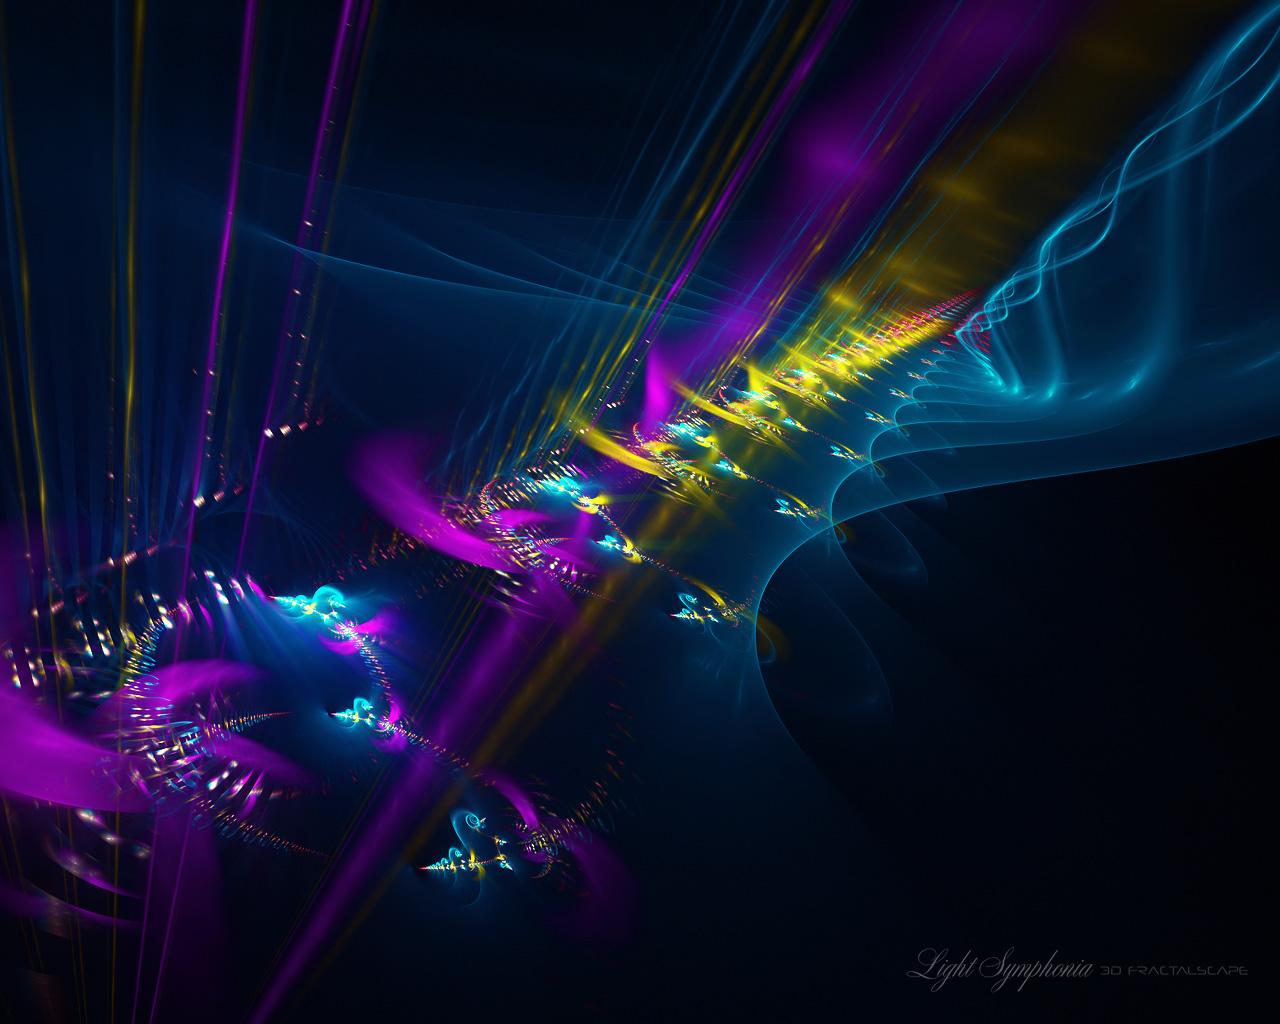 Light Symphonia 34